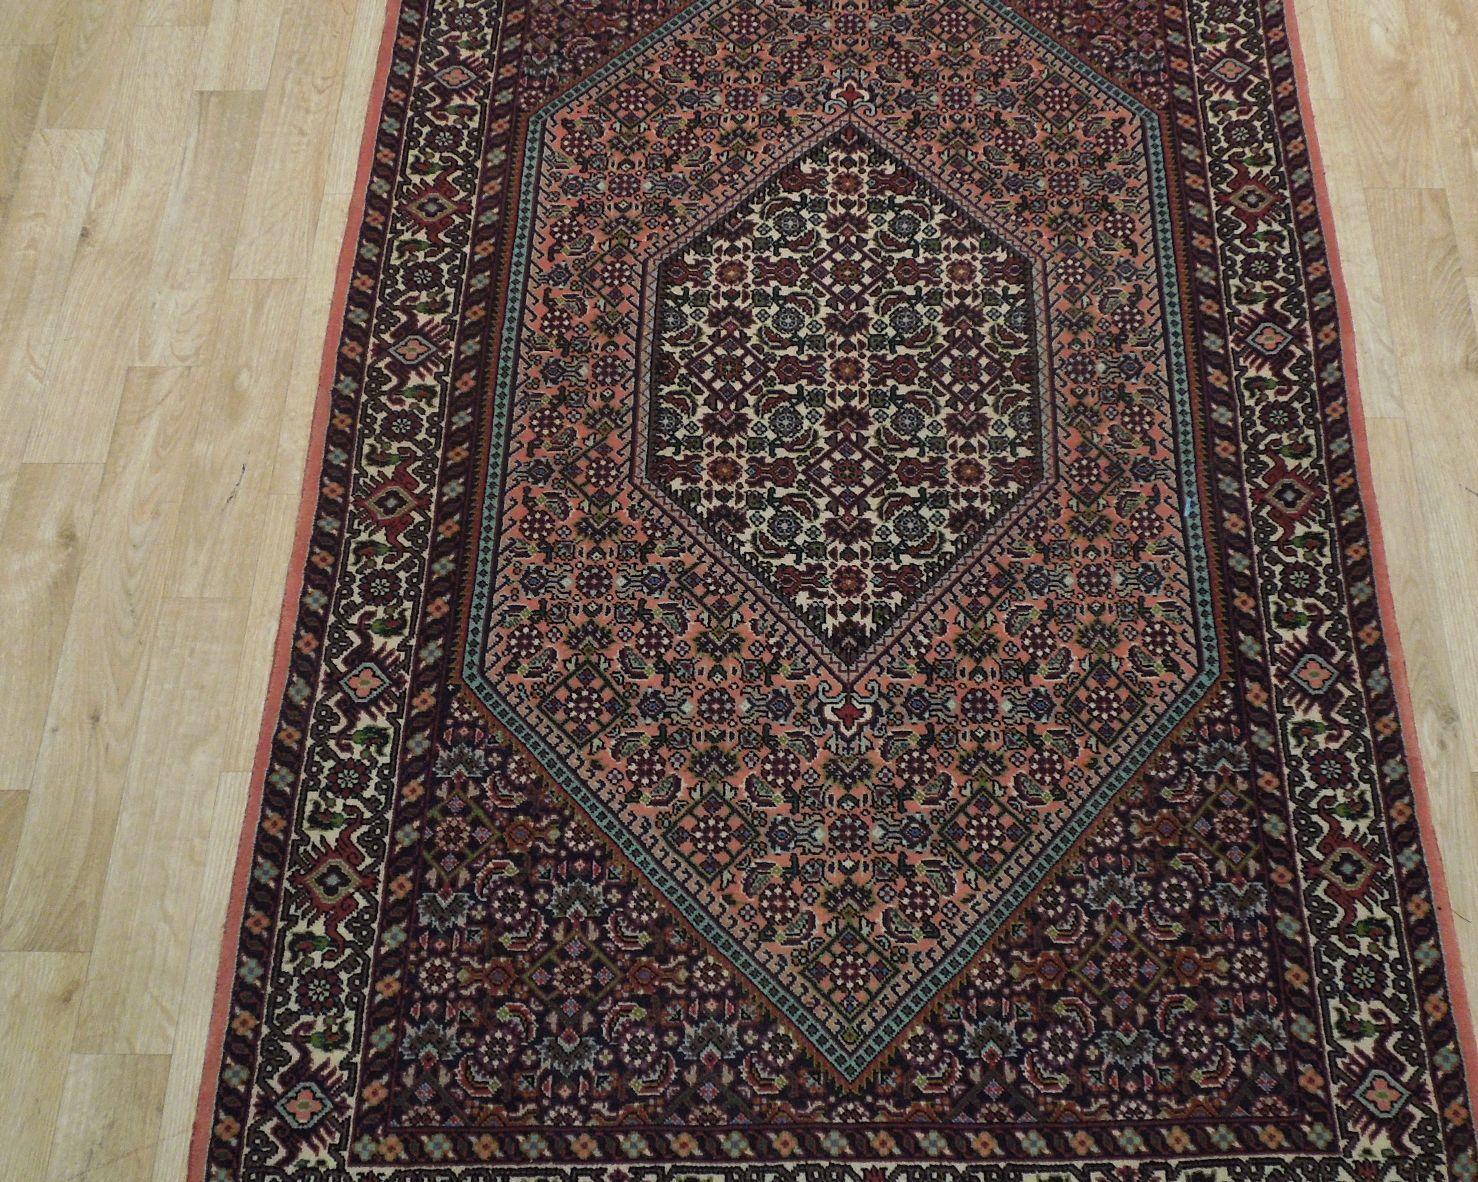 3' x 6' Floral Durable Herati Peach Traditional Persian Wool Handmade Rug